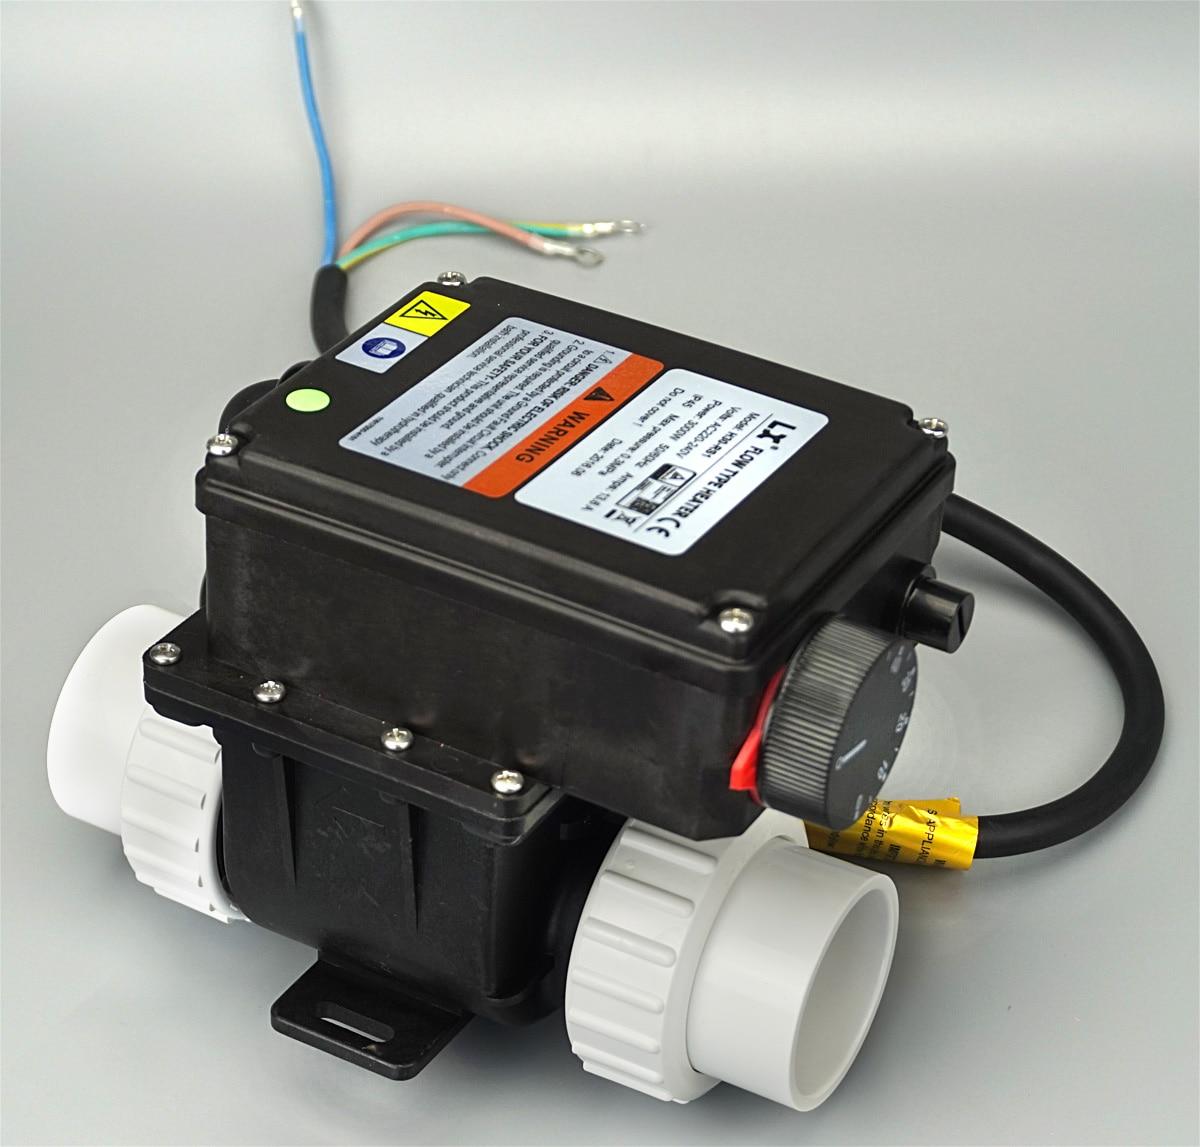 LX Spa Heater & bathtub heater H15 RS1 1.5KW/220V TUB POOL HEATER-in ...